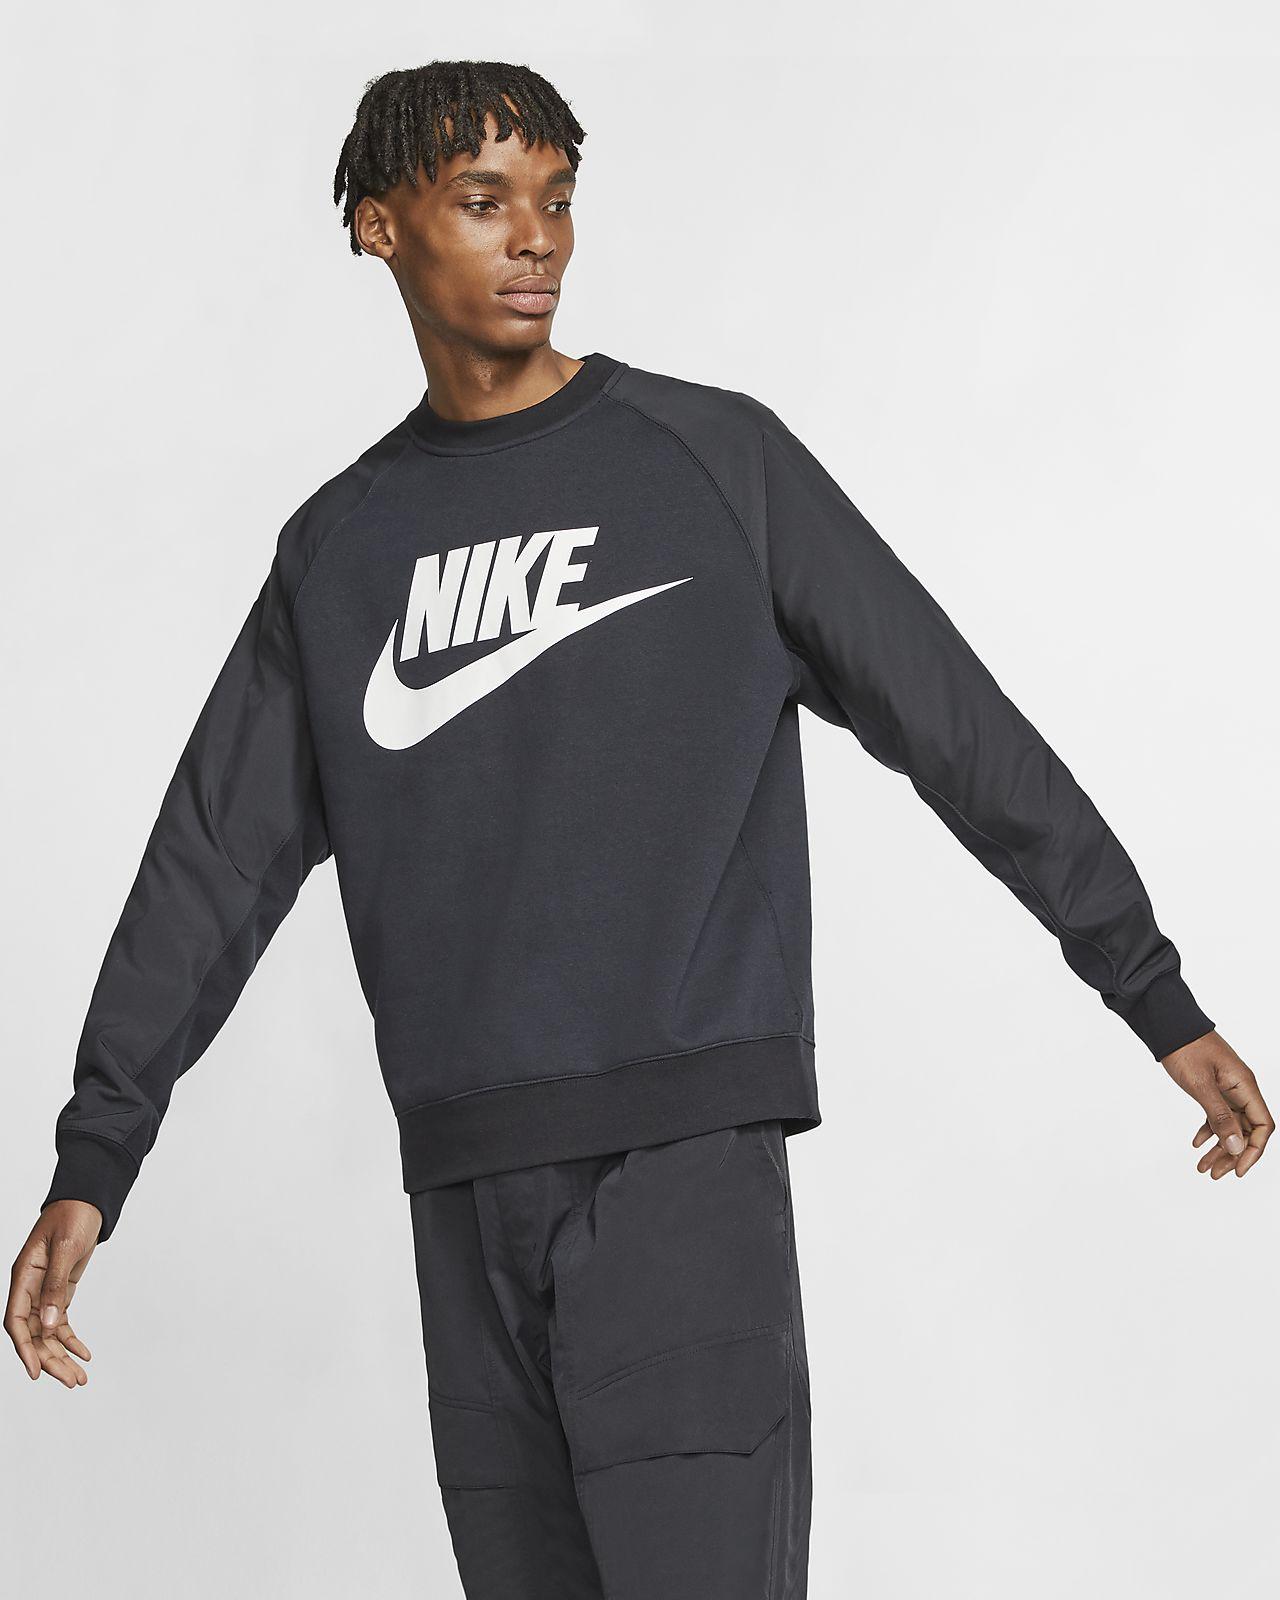 Nike Sportswear Herenshirt met ronde hals en graphic